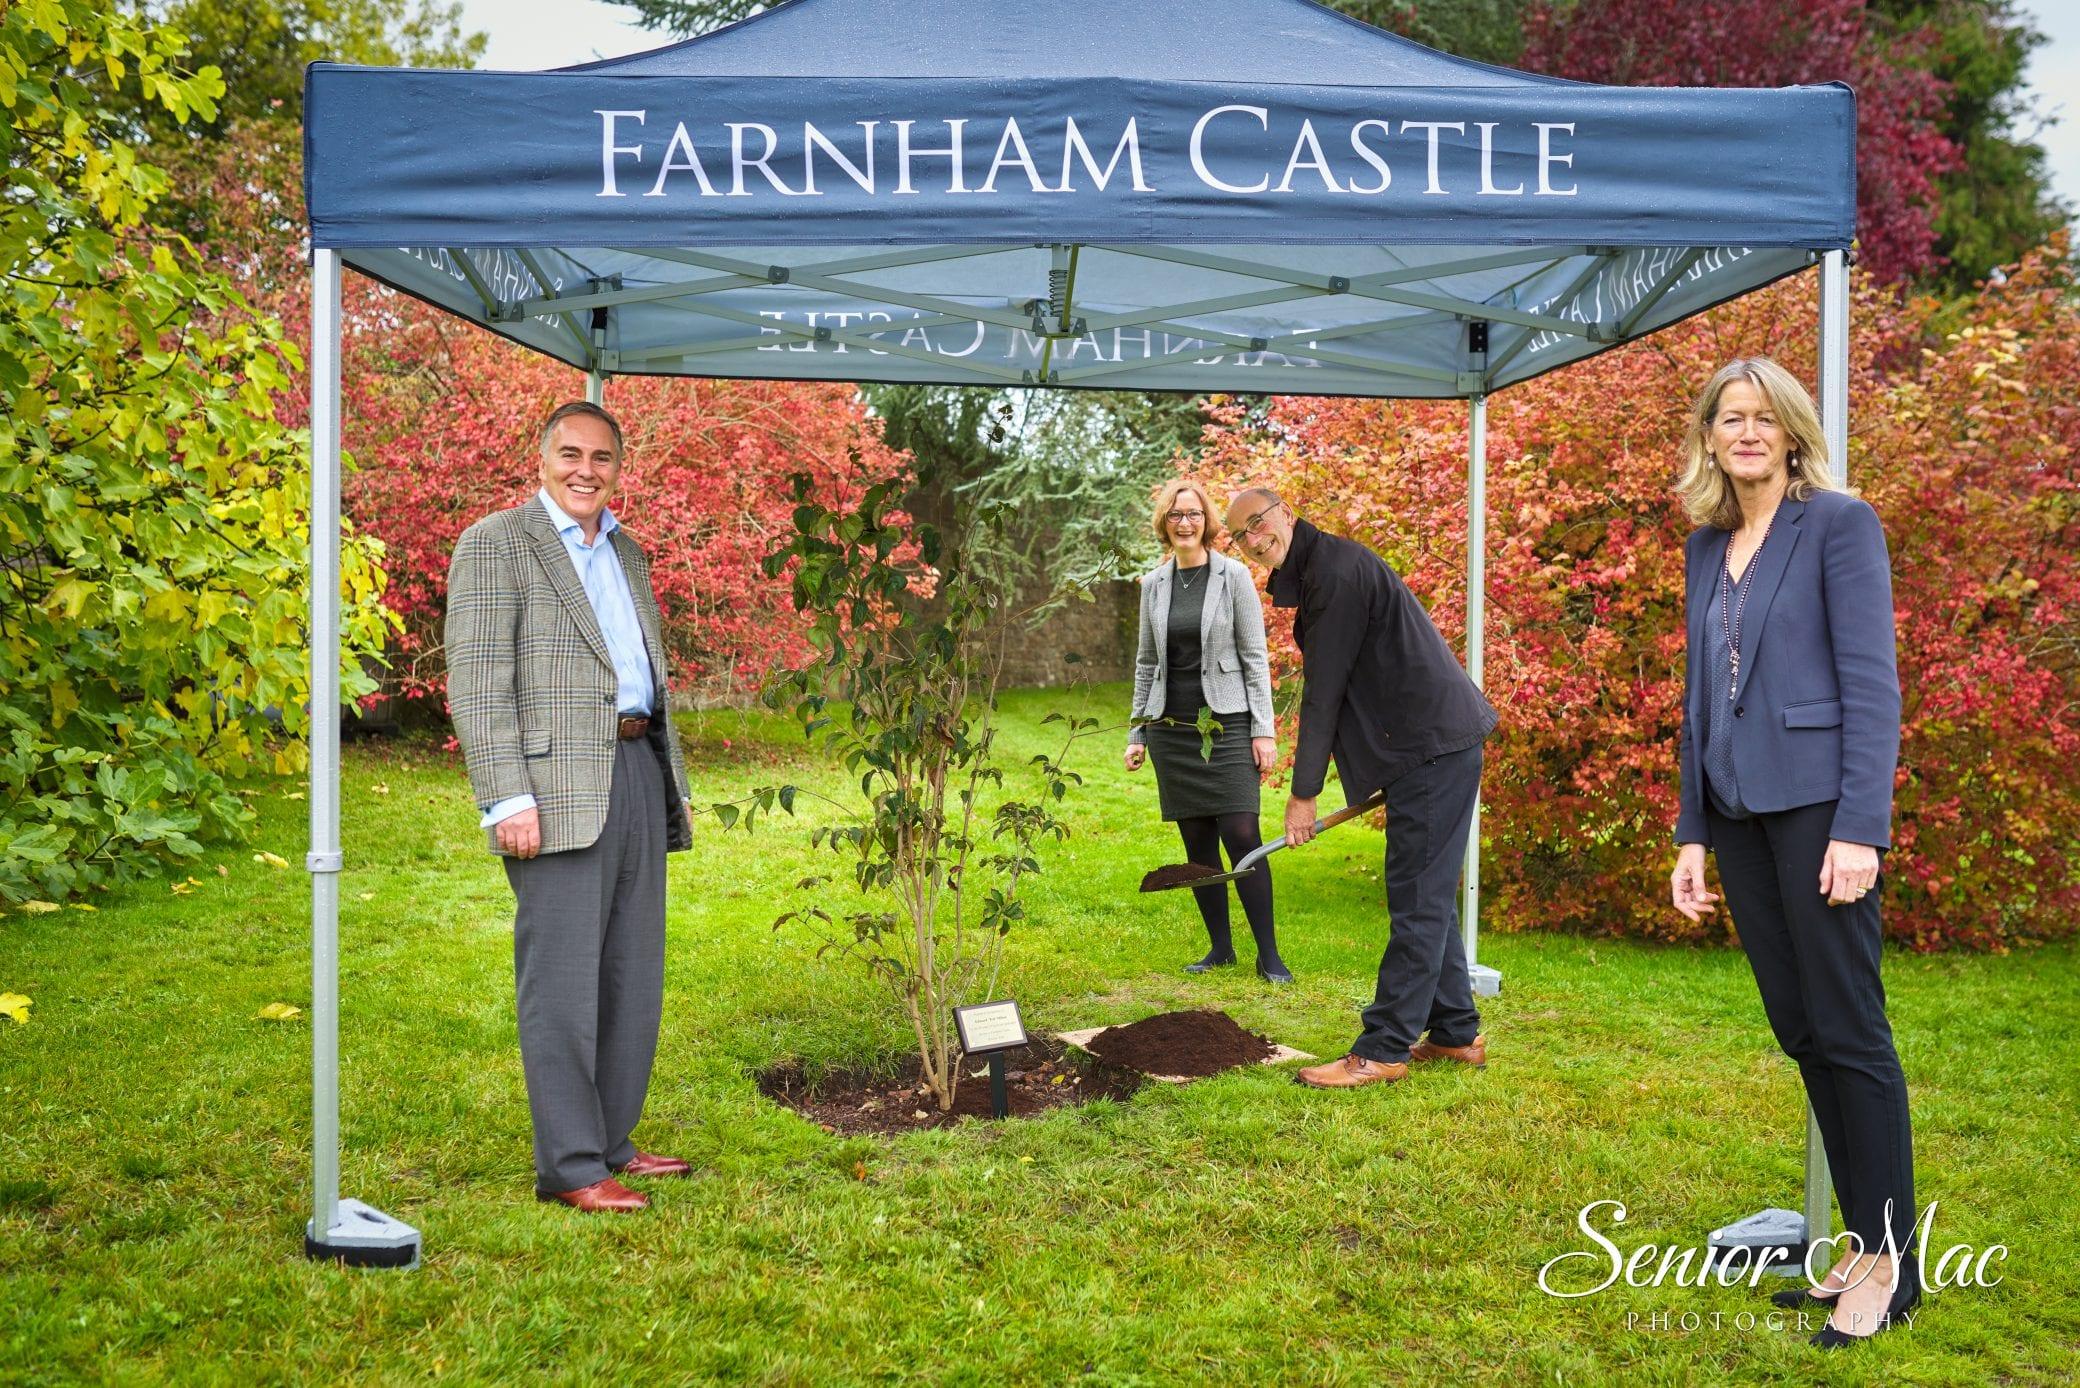 Tree planting at Farnham Castle